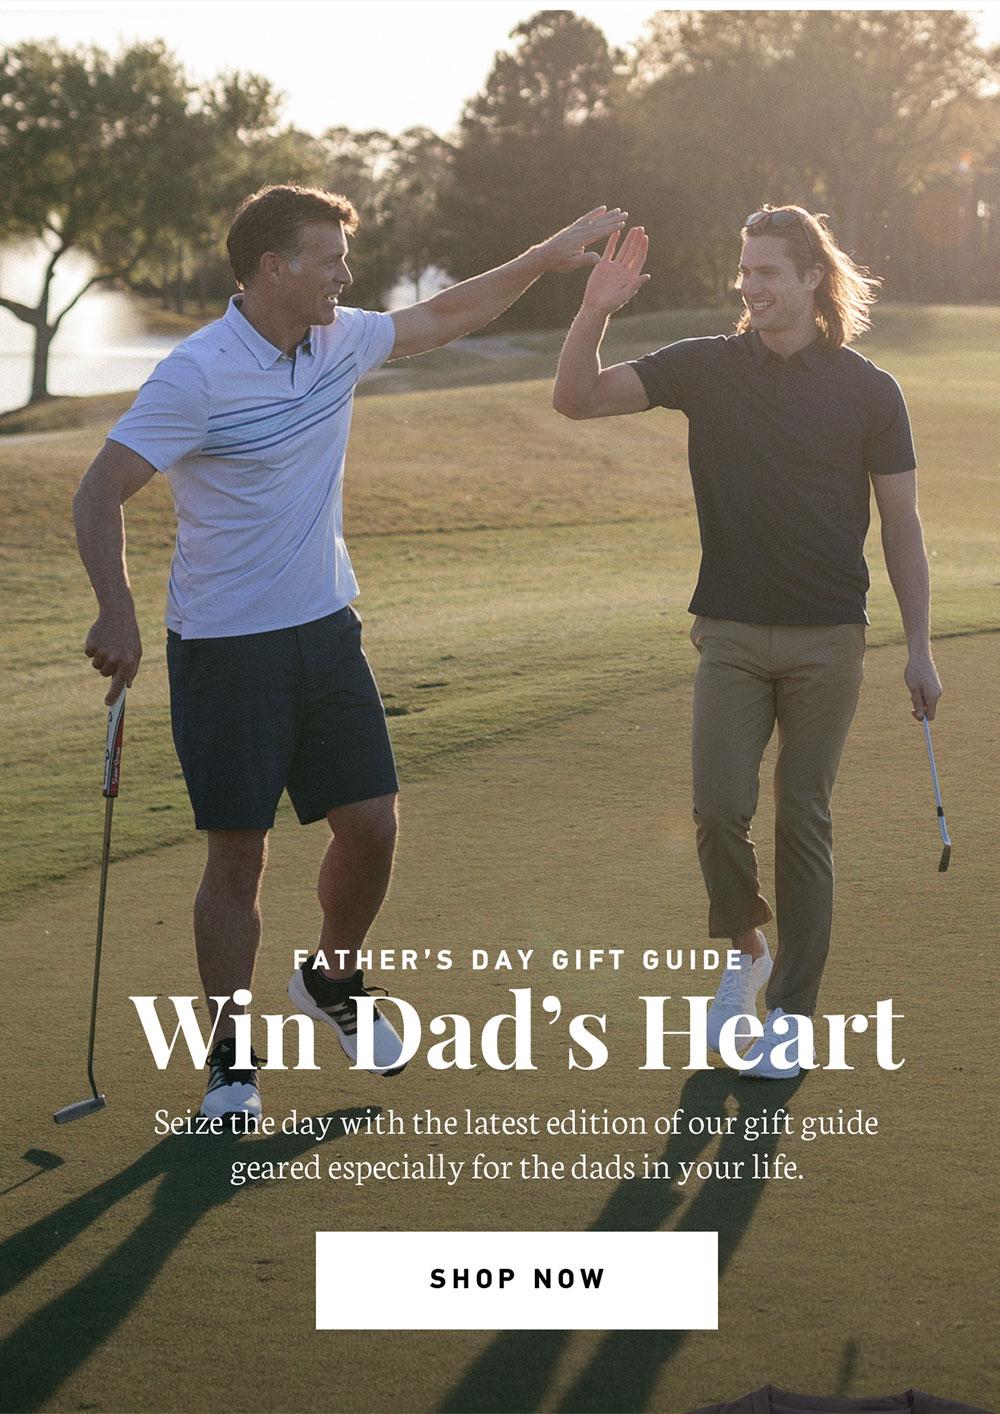 Win Dad's Heart